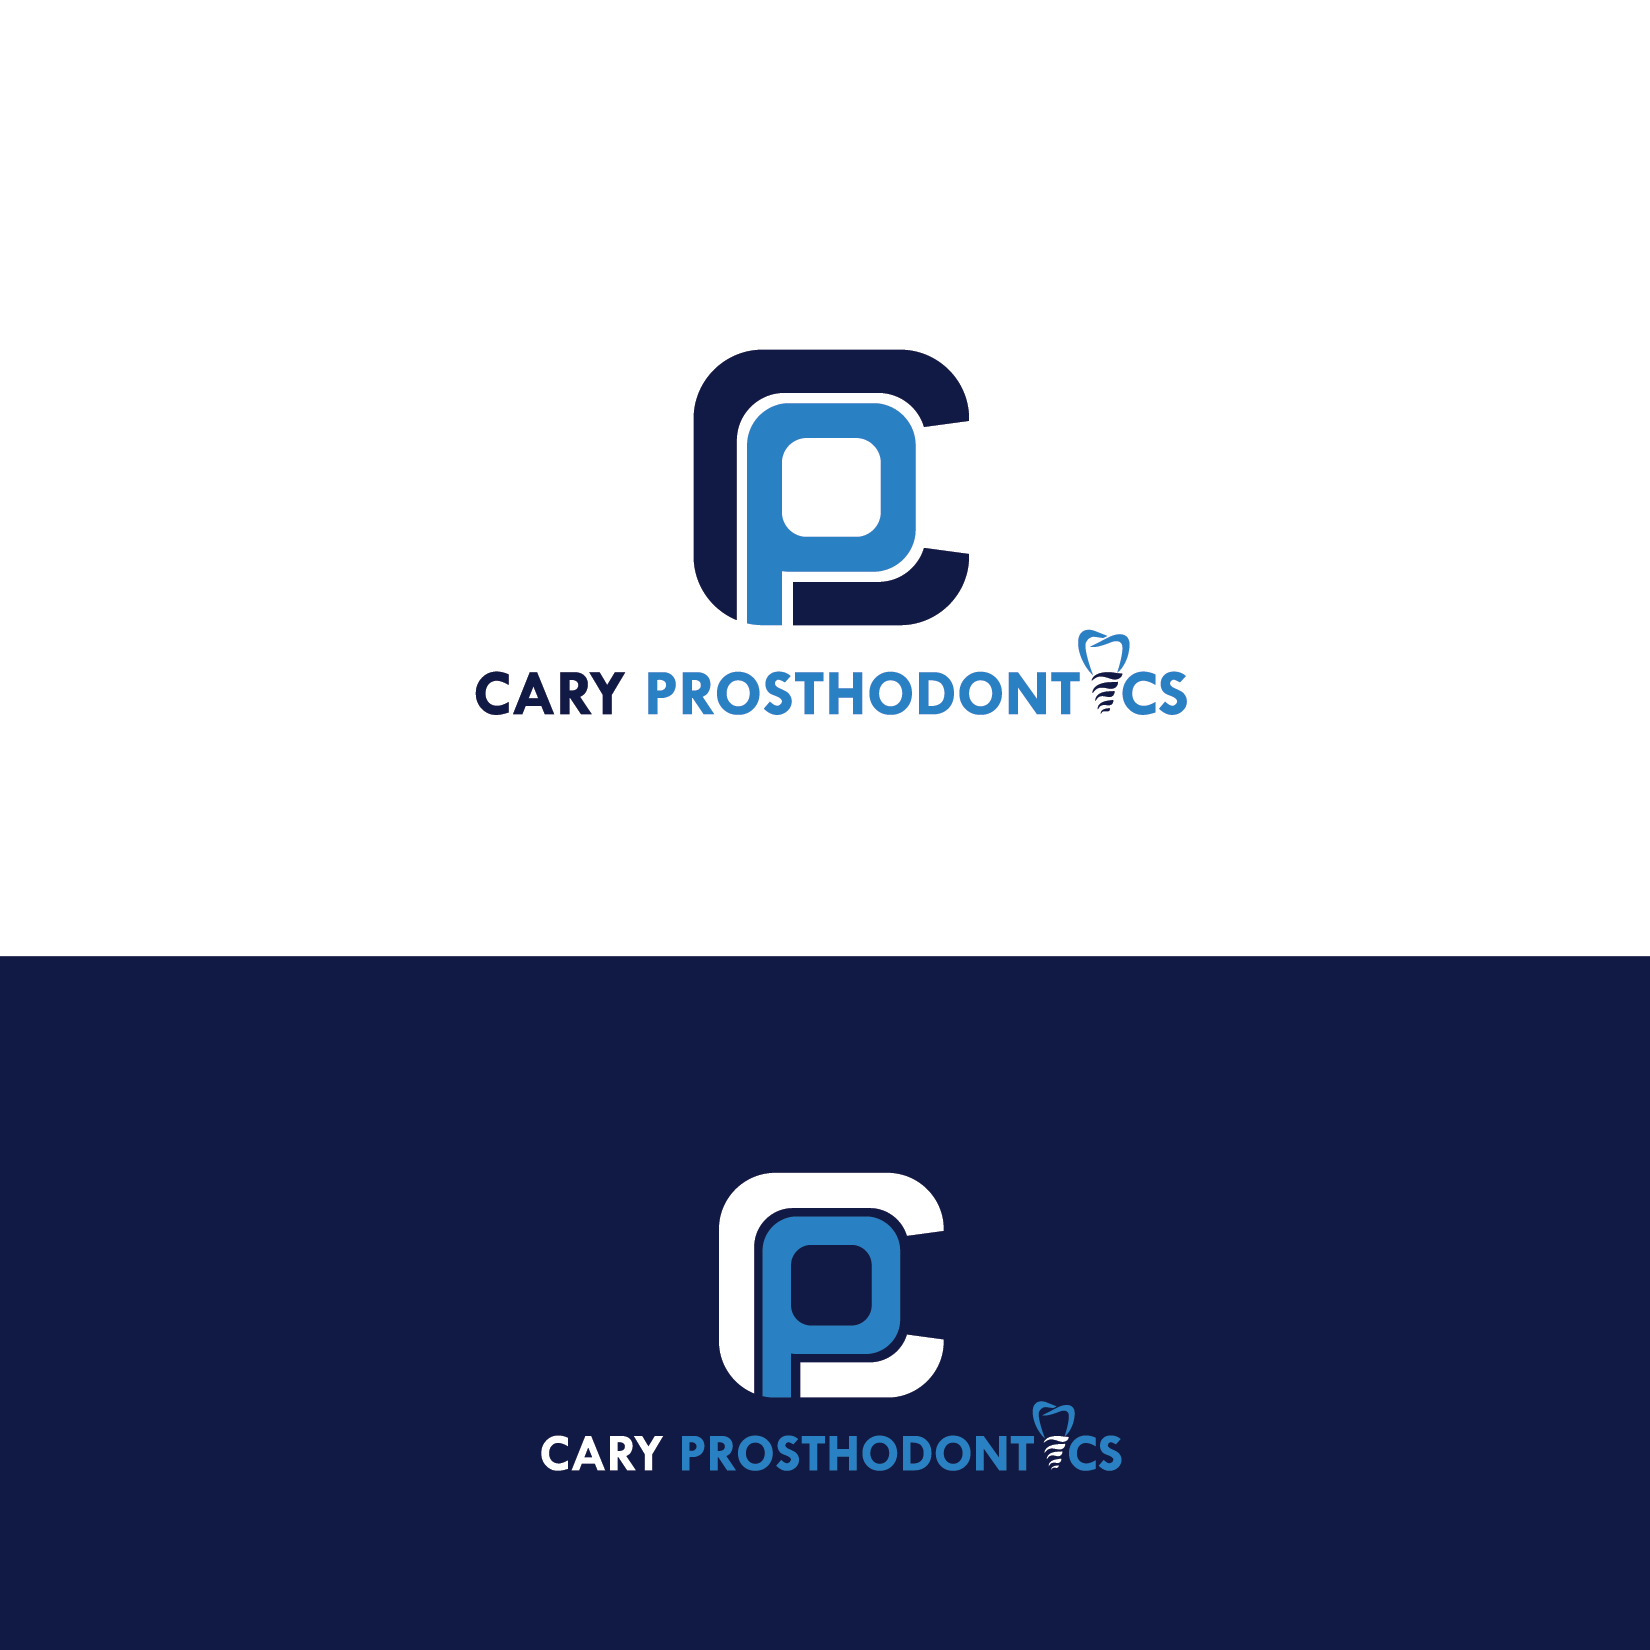 Logo Design by Private User - Entry No. 158 in the Logo Design Contest Cary Prosthodontics Logo Design.